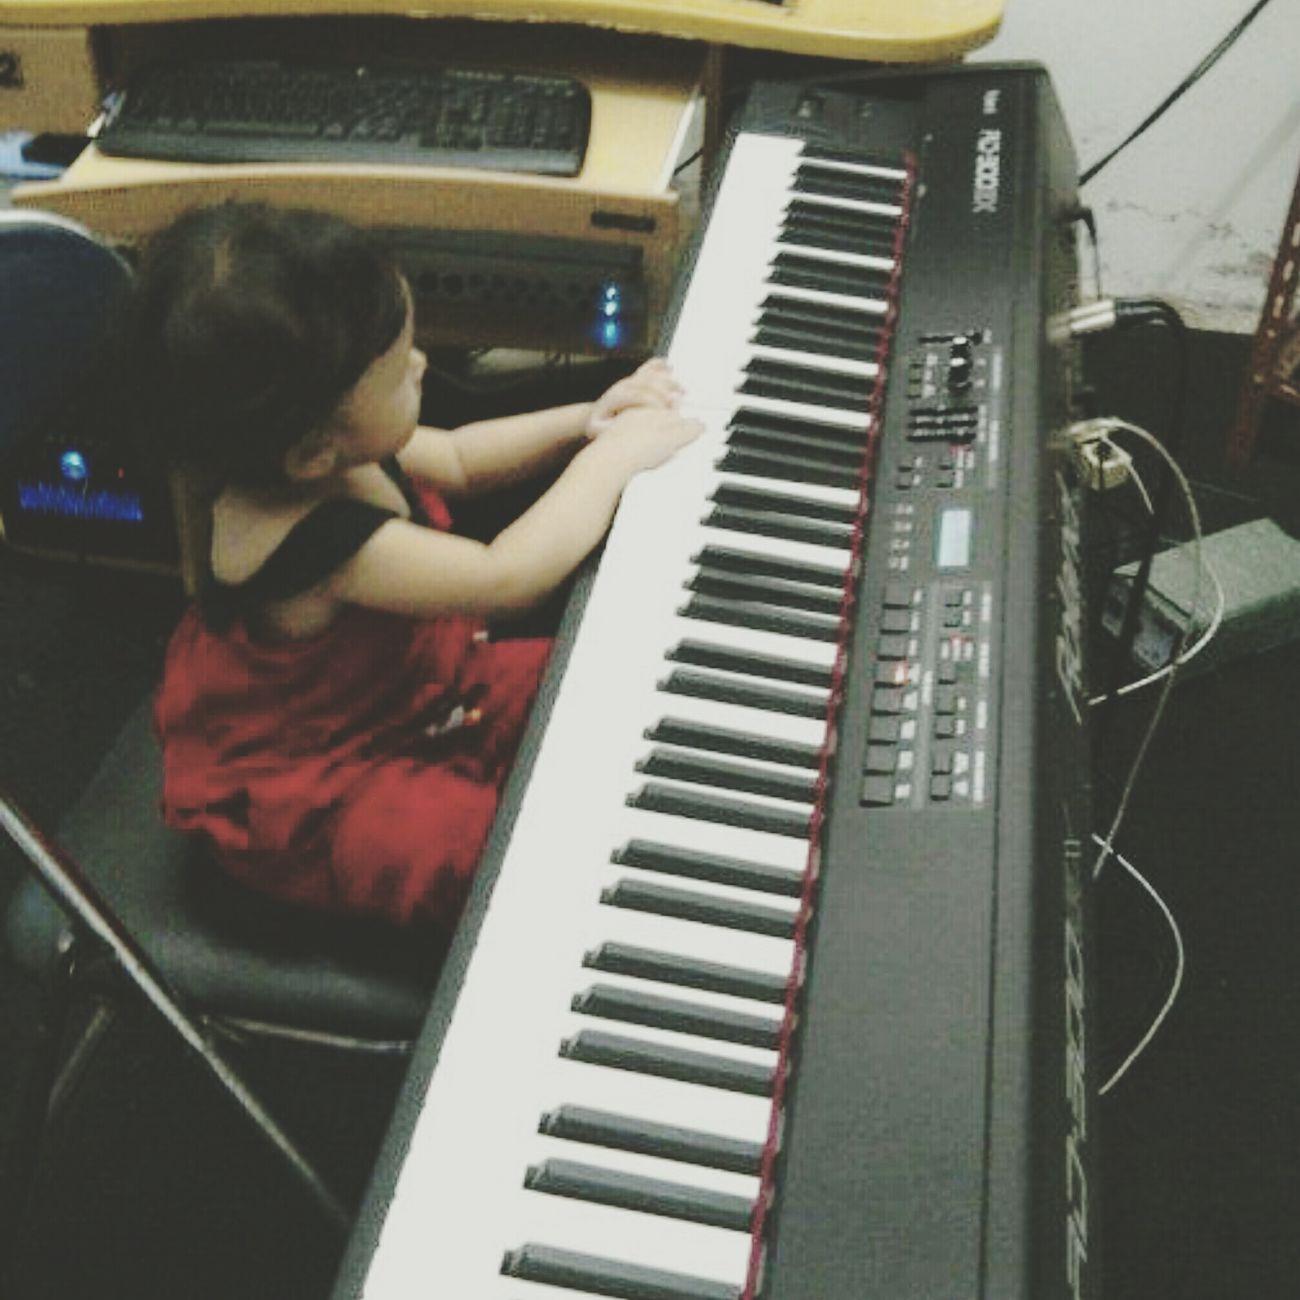 Everyday Education Music Musician Playing Piano Learn Learning Enjoying Life Eye4photography  Kidsphotography